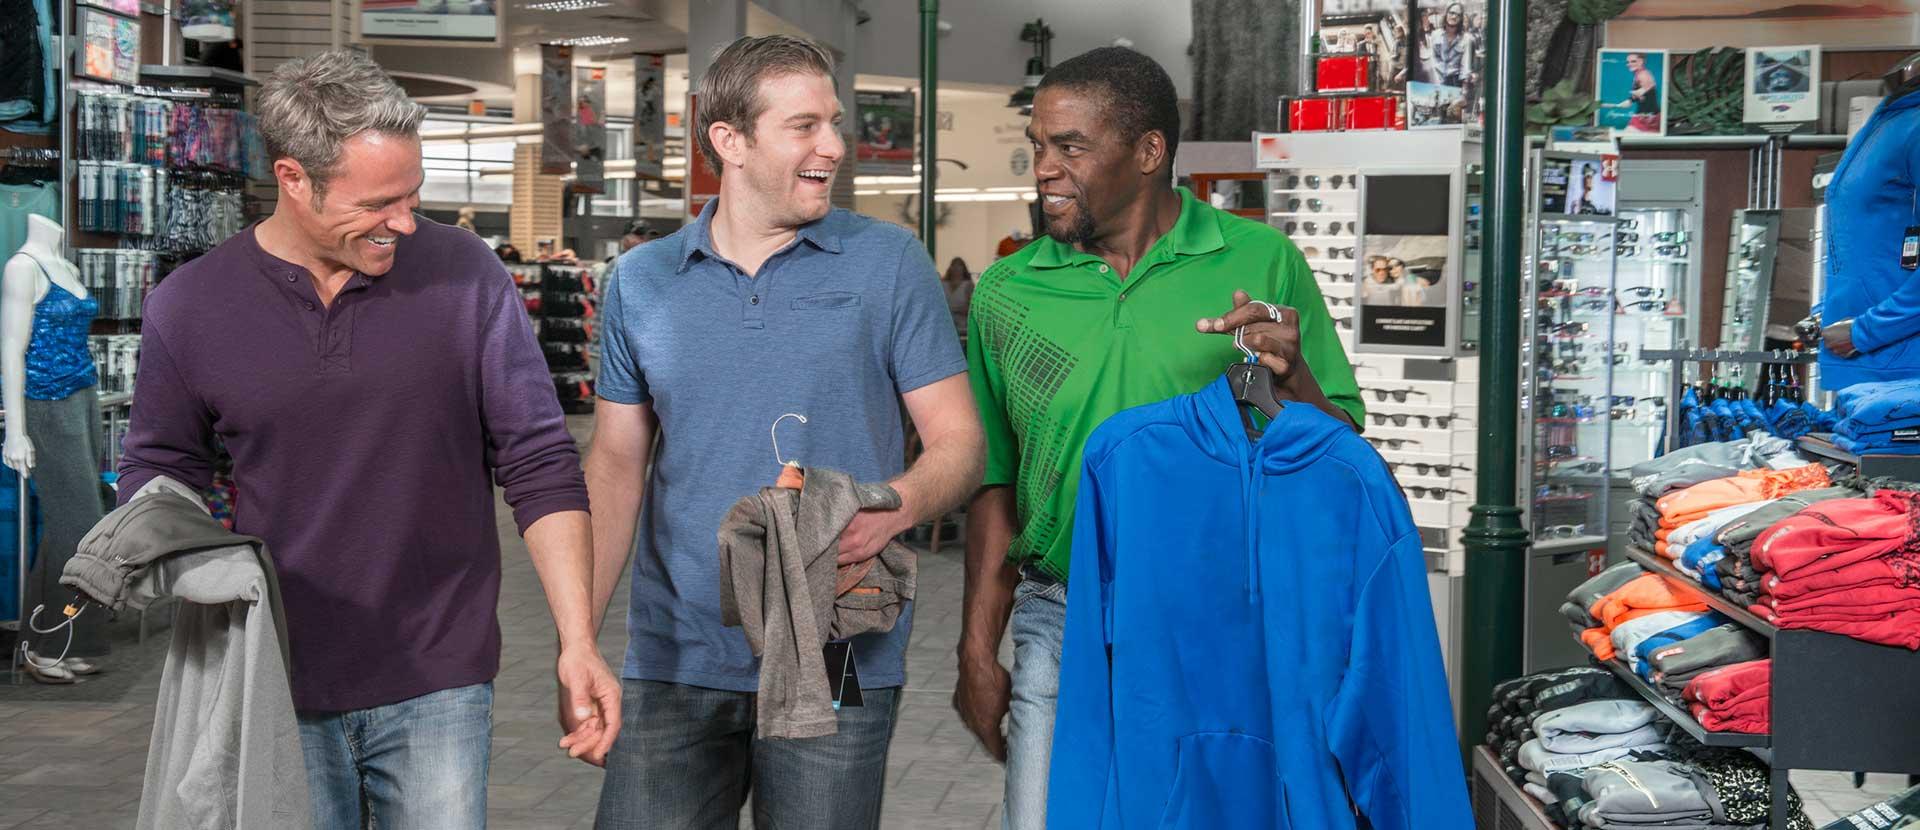 Men shopping at the Fox River Mall